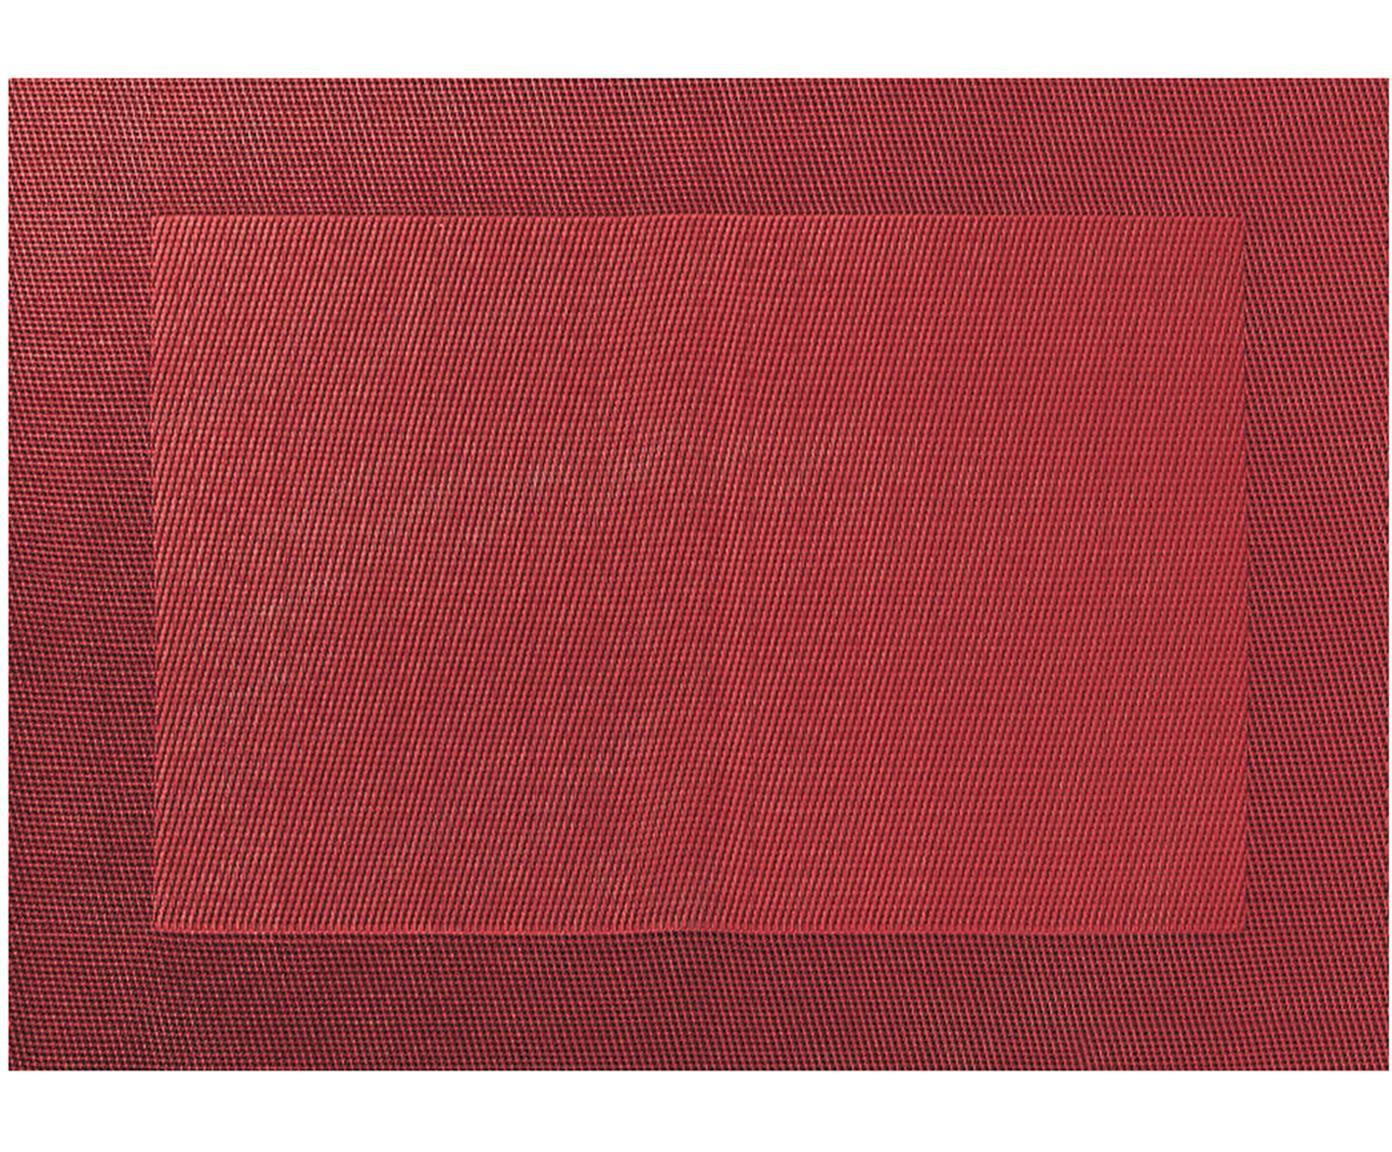 Placemats Trefl, 2 stuks, Kunststof (PVC), Rood, 33 x 46 cm